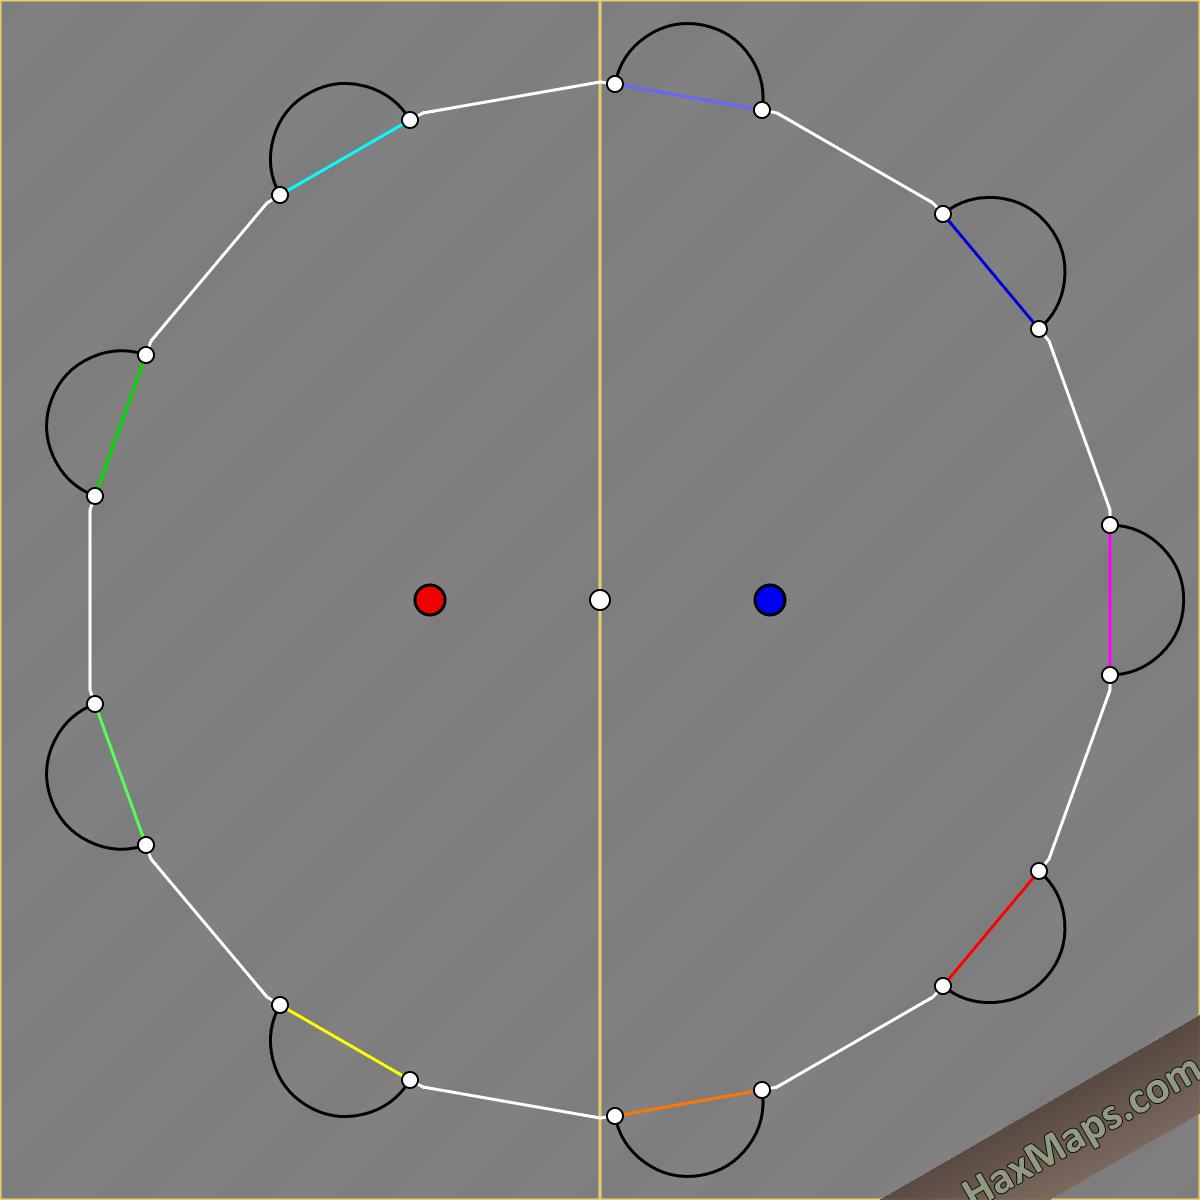 hax ball maps | 9 Man x Man Bounce Corrig